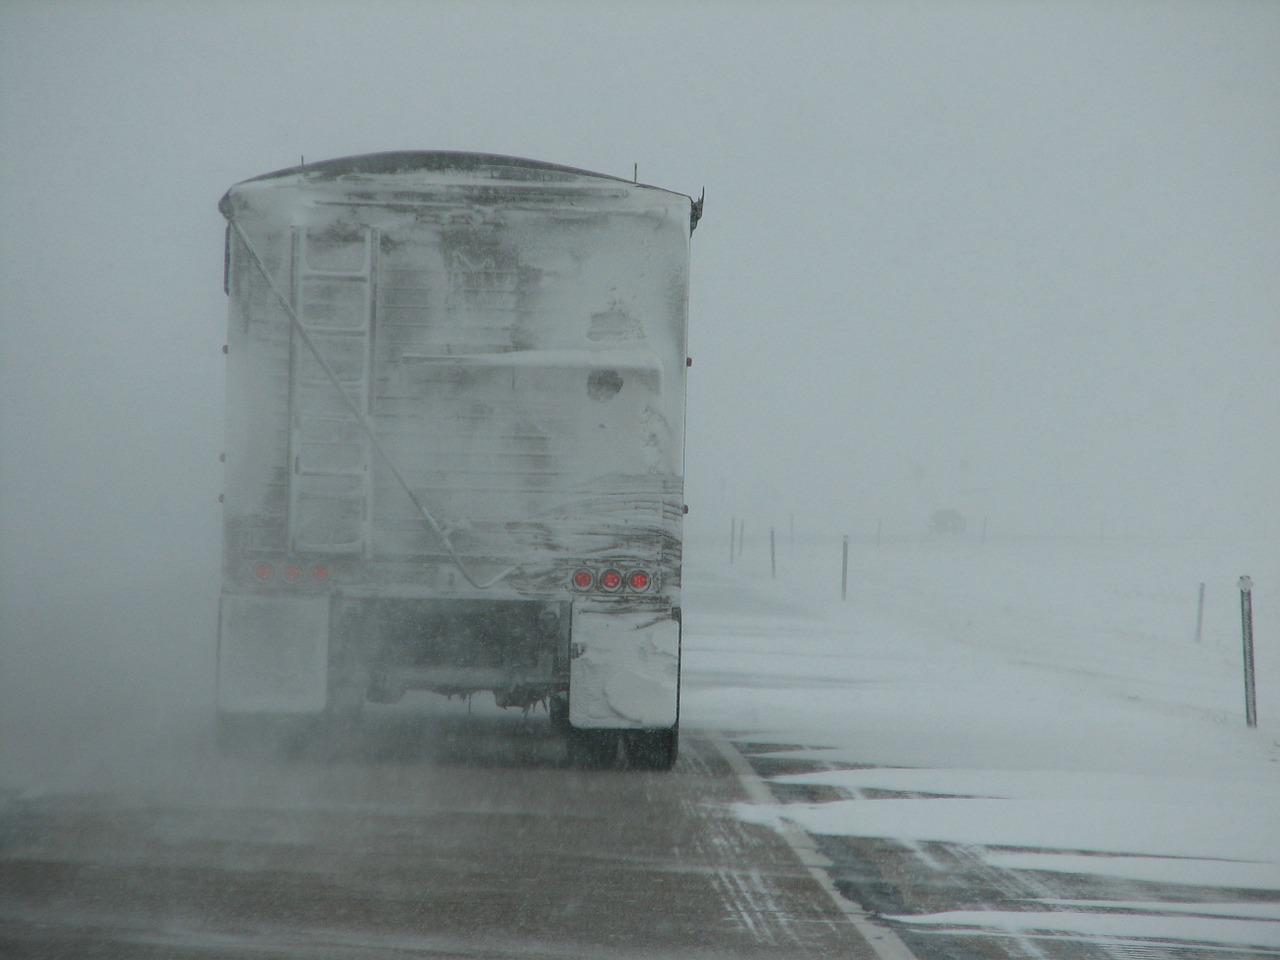 Midwest Fleets Face Challenges Amidst Polar Vortex